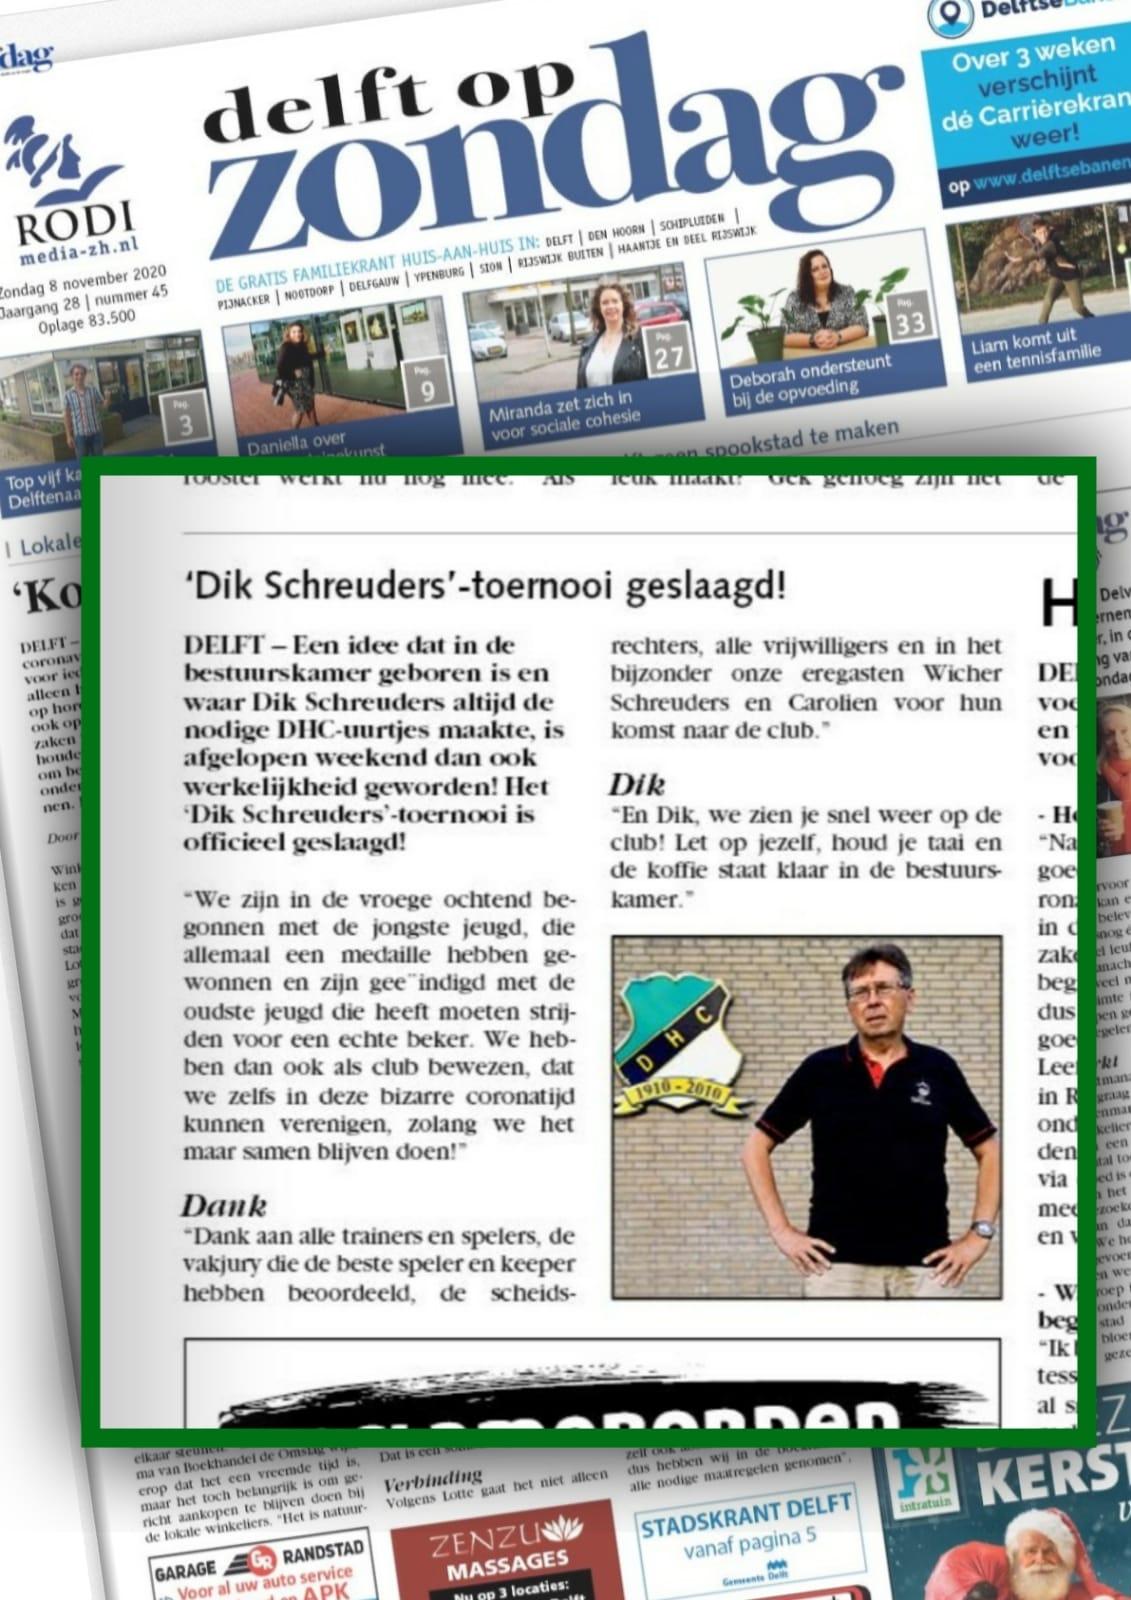 Dik Schreuders toernooi in de Zondagskrant van Rodi Media